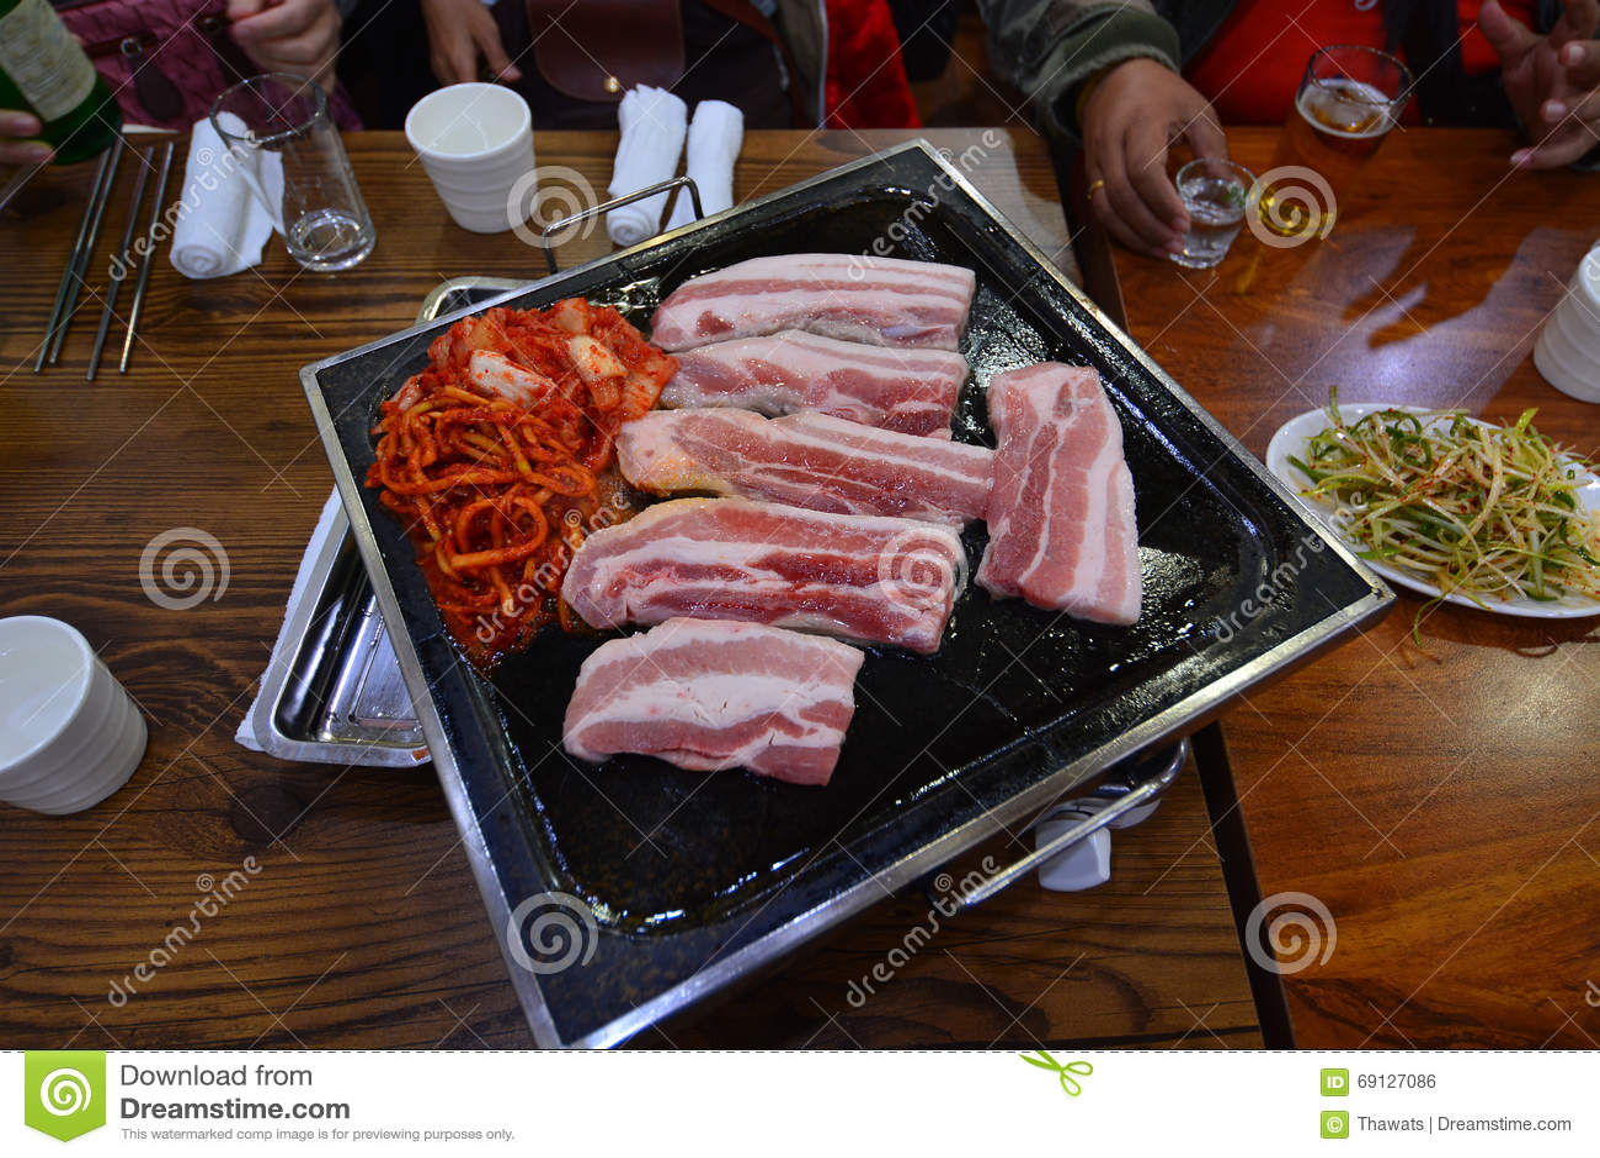 Bbq Belly Korean Pork